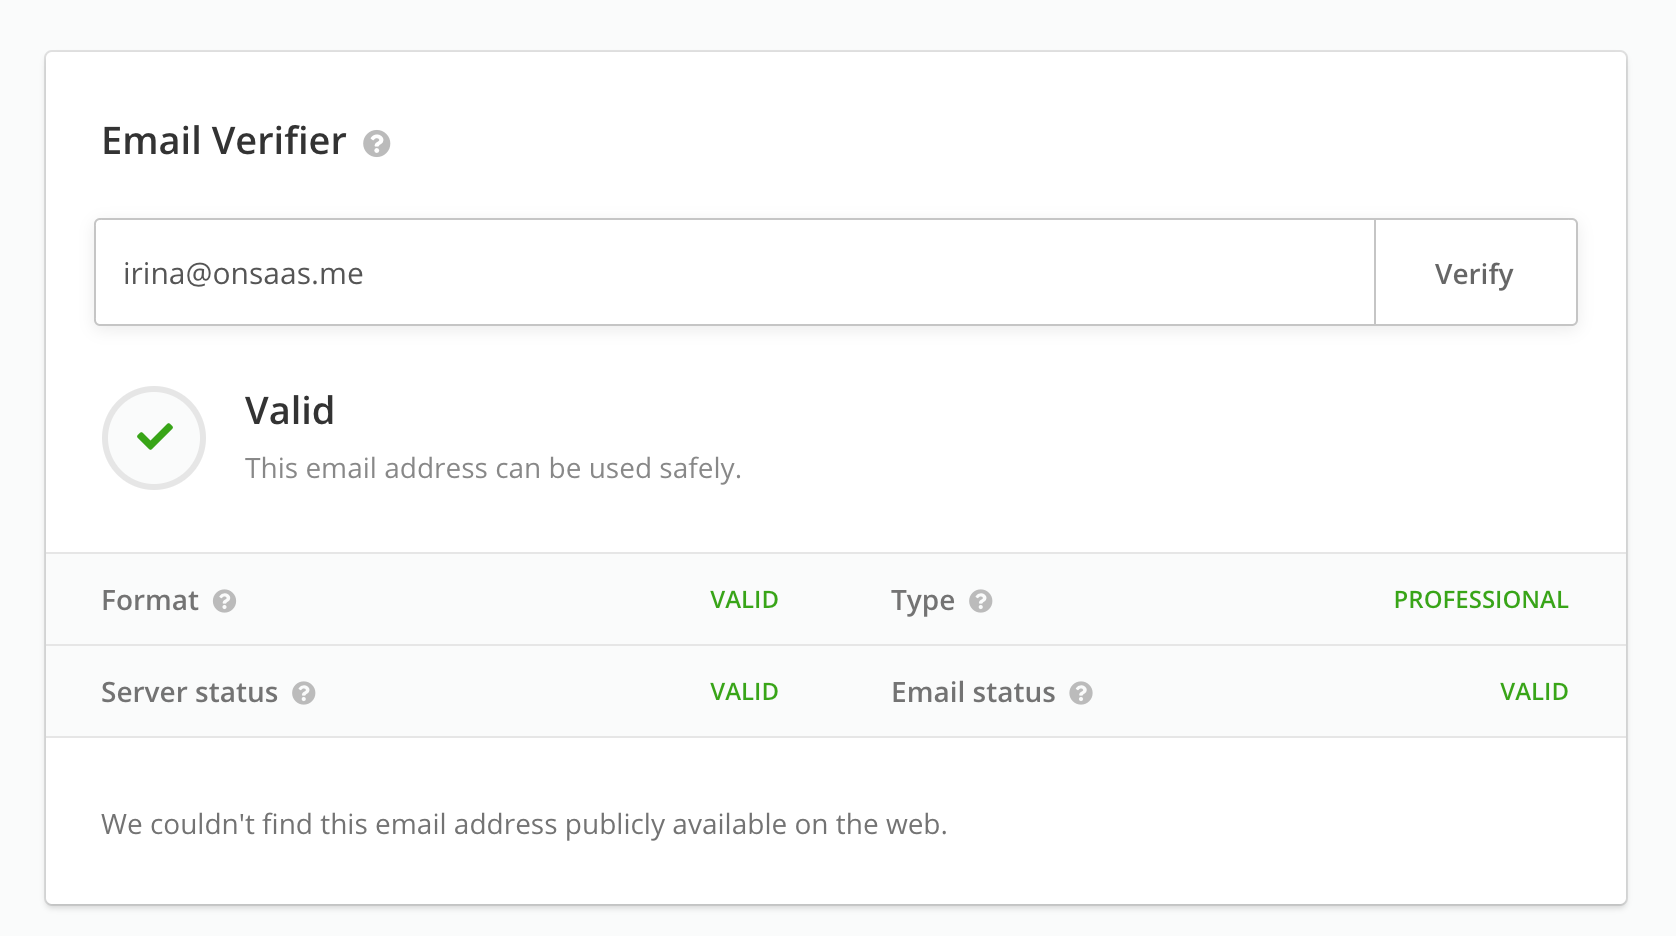 Hunter Email Verifier - verified email address